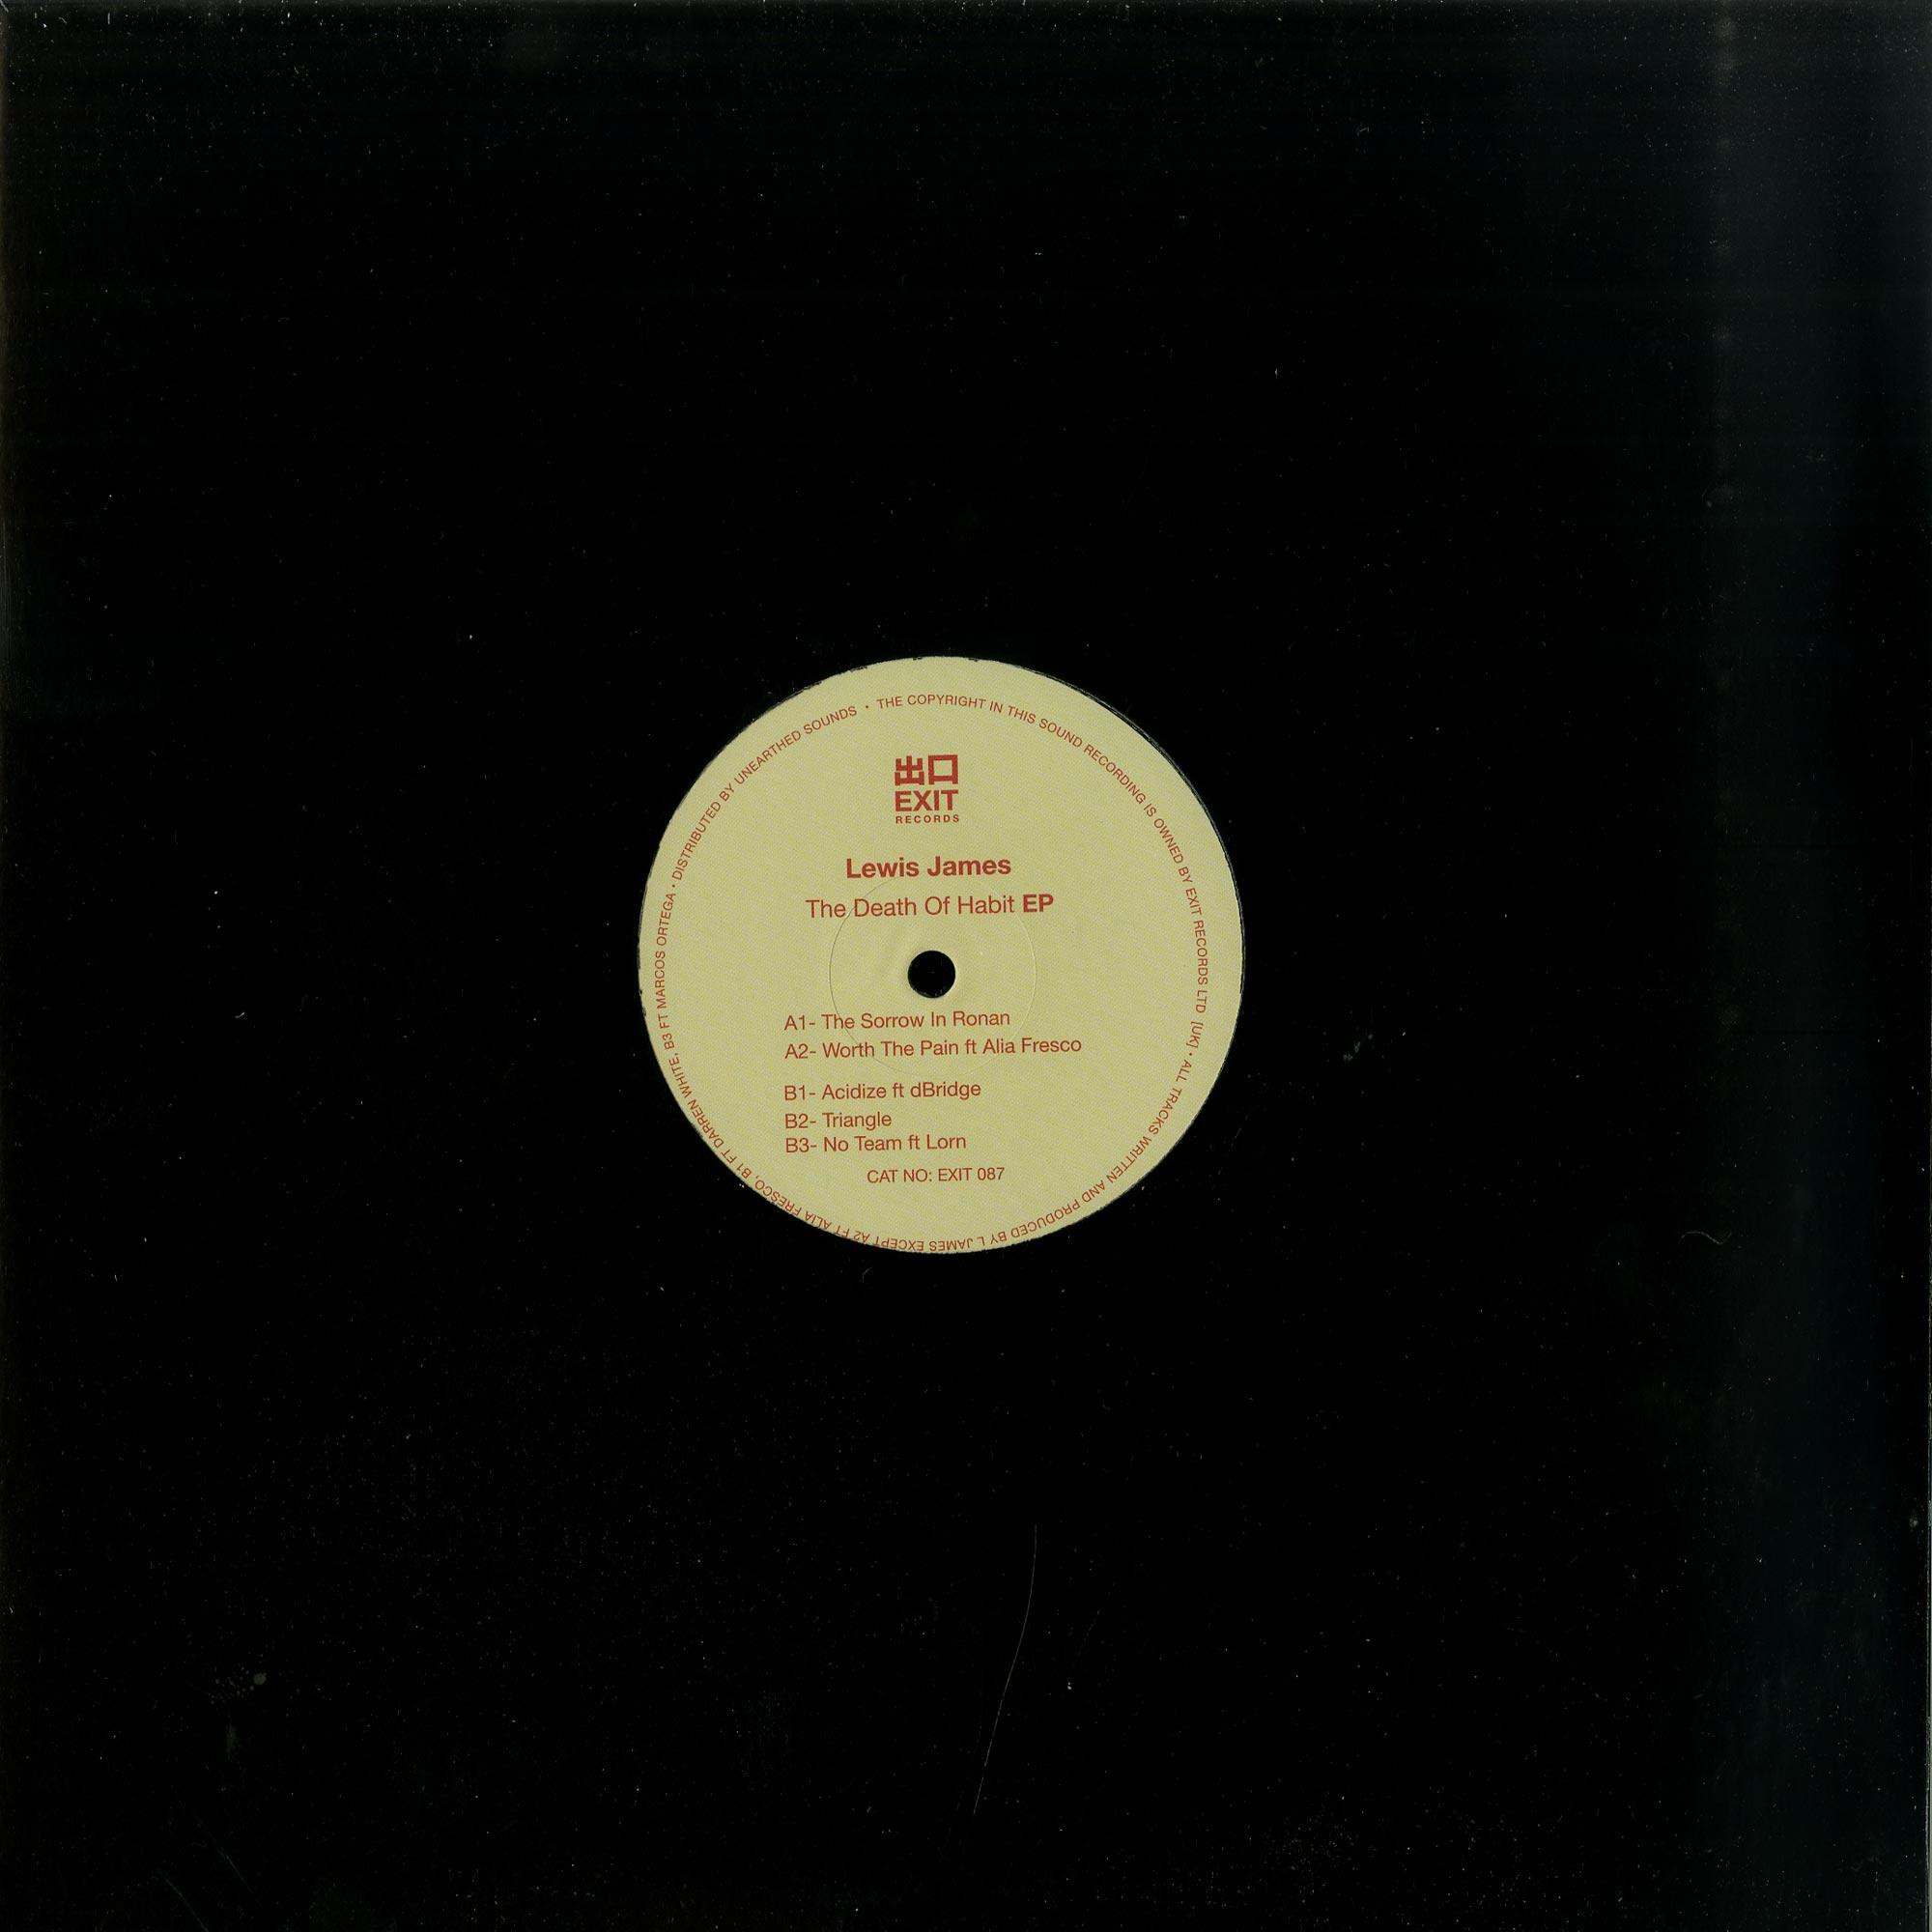 Lewis James - THE DEATH OF HABIT EP